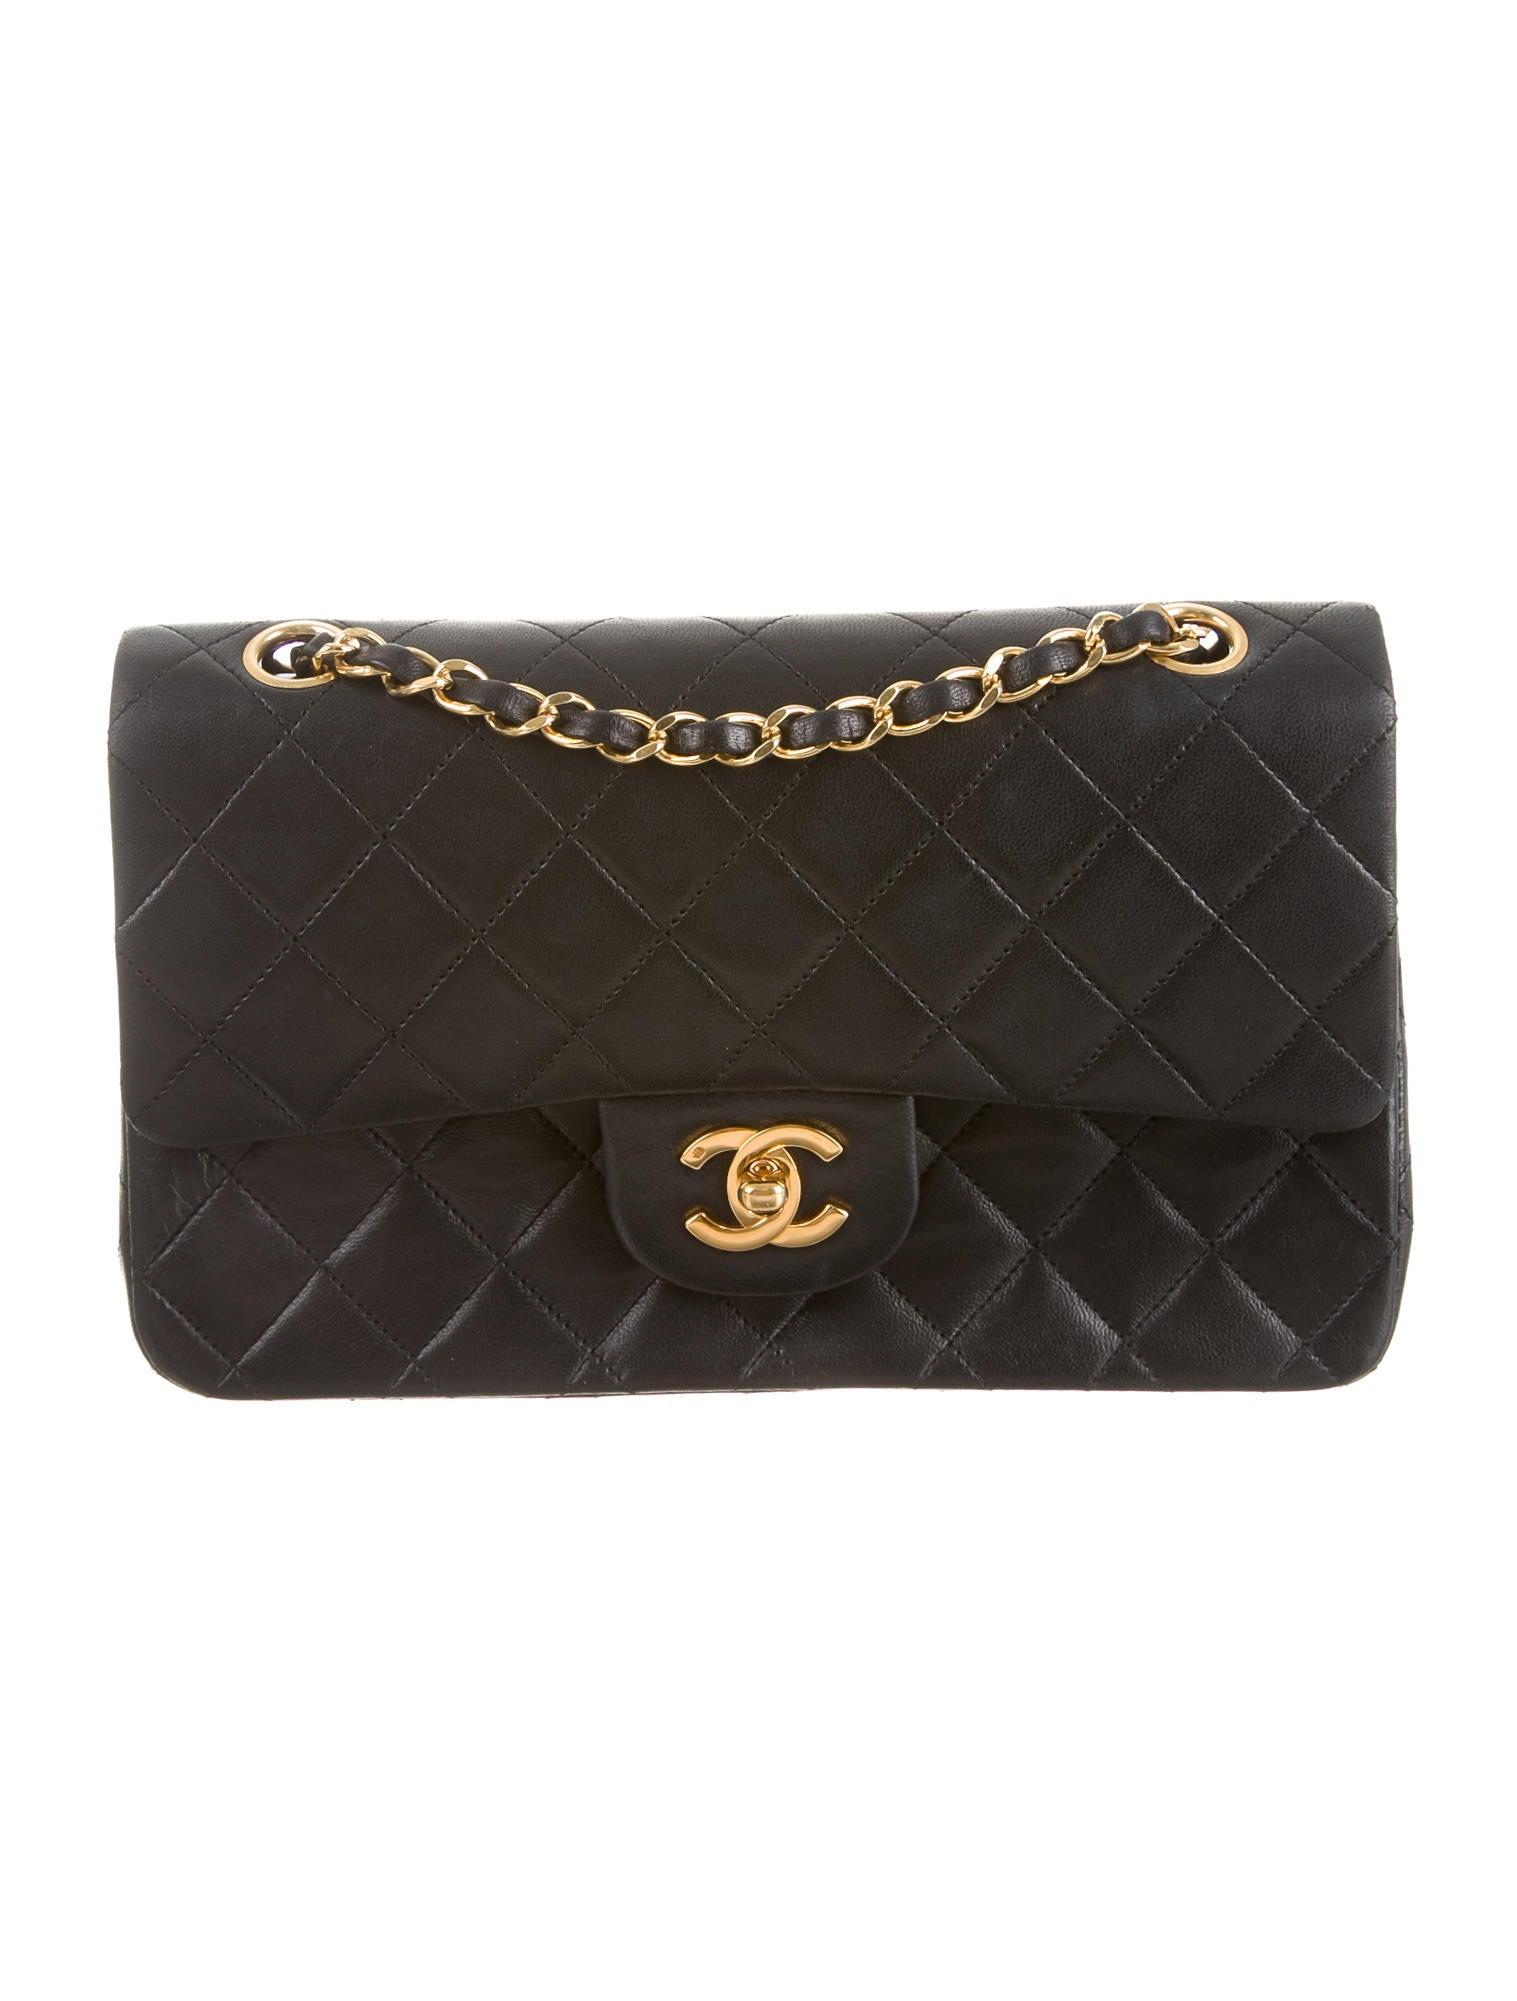 Chanel Small Classic Double Flap Bag Handbags Cha65039